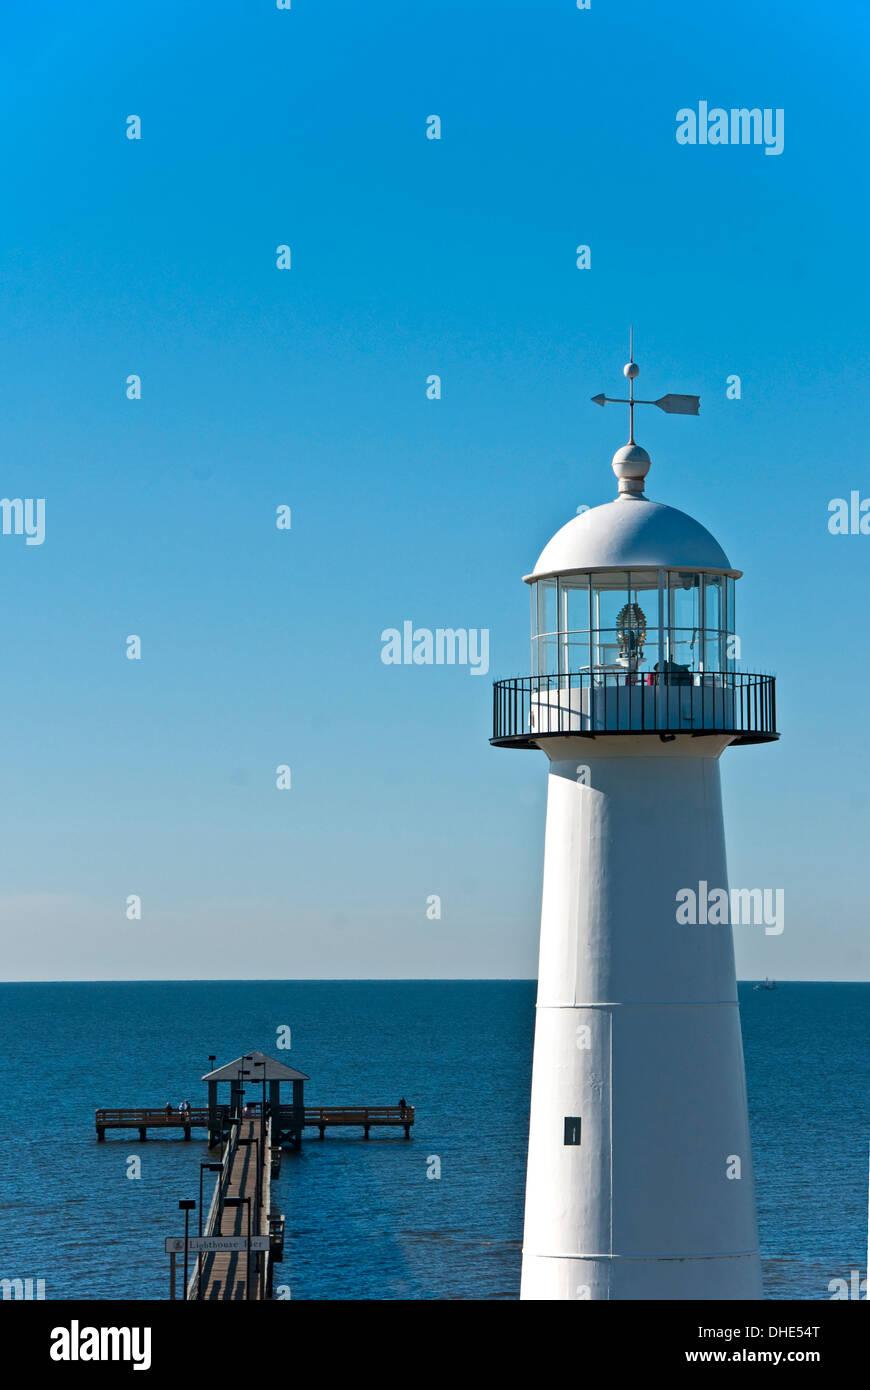 Mississippi Gulf Coast S Biloxi Lighthouse And Lighthouse Pier On Stock Photo Alamy